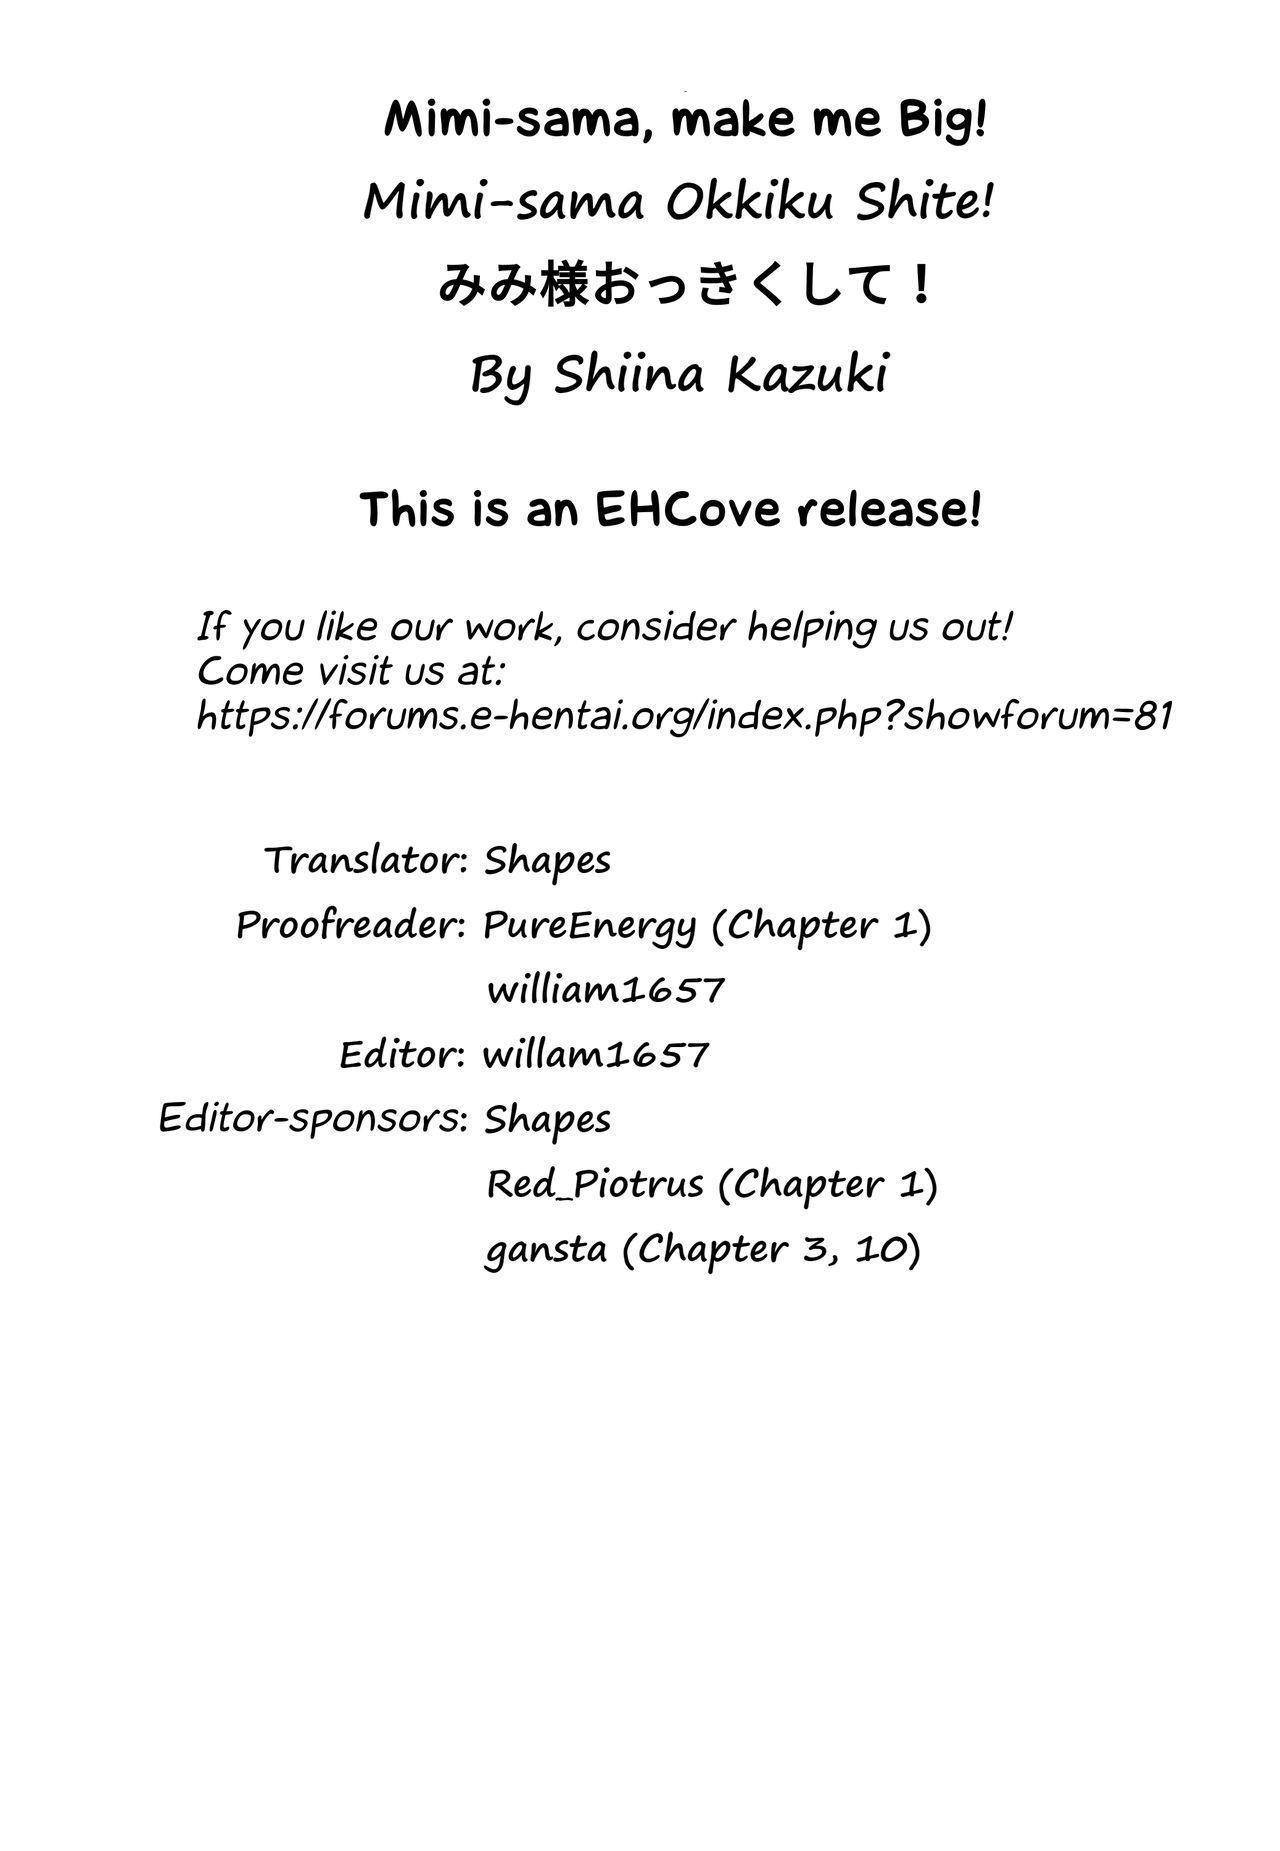 [Shiina Kazuki] Mimi-sama Okkiku Shite! - Mimi... Make me Big! | Mimi-sama make me Big! Ch. 1-3, 10 [English] [EHCove] 82